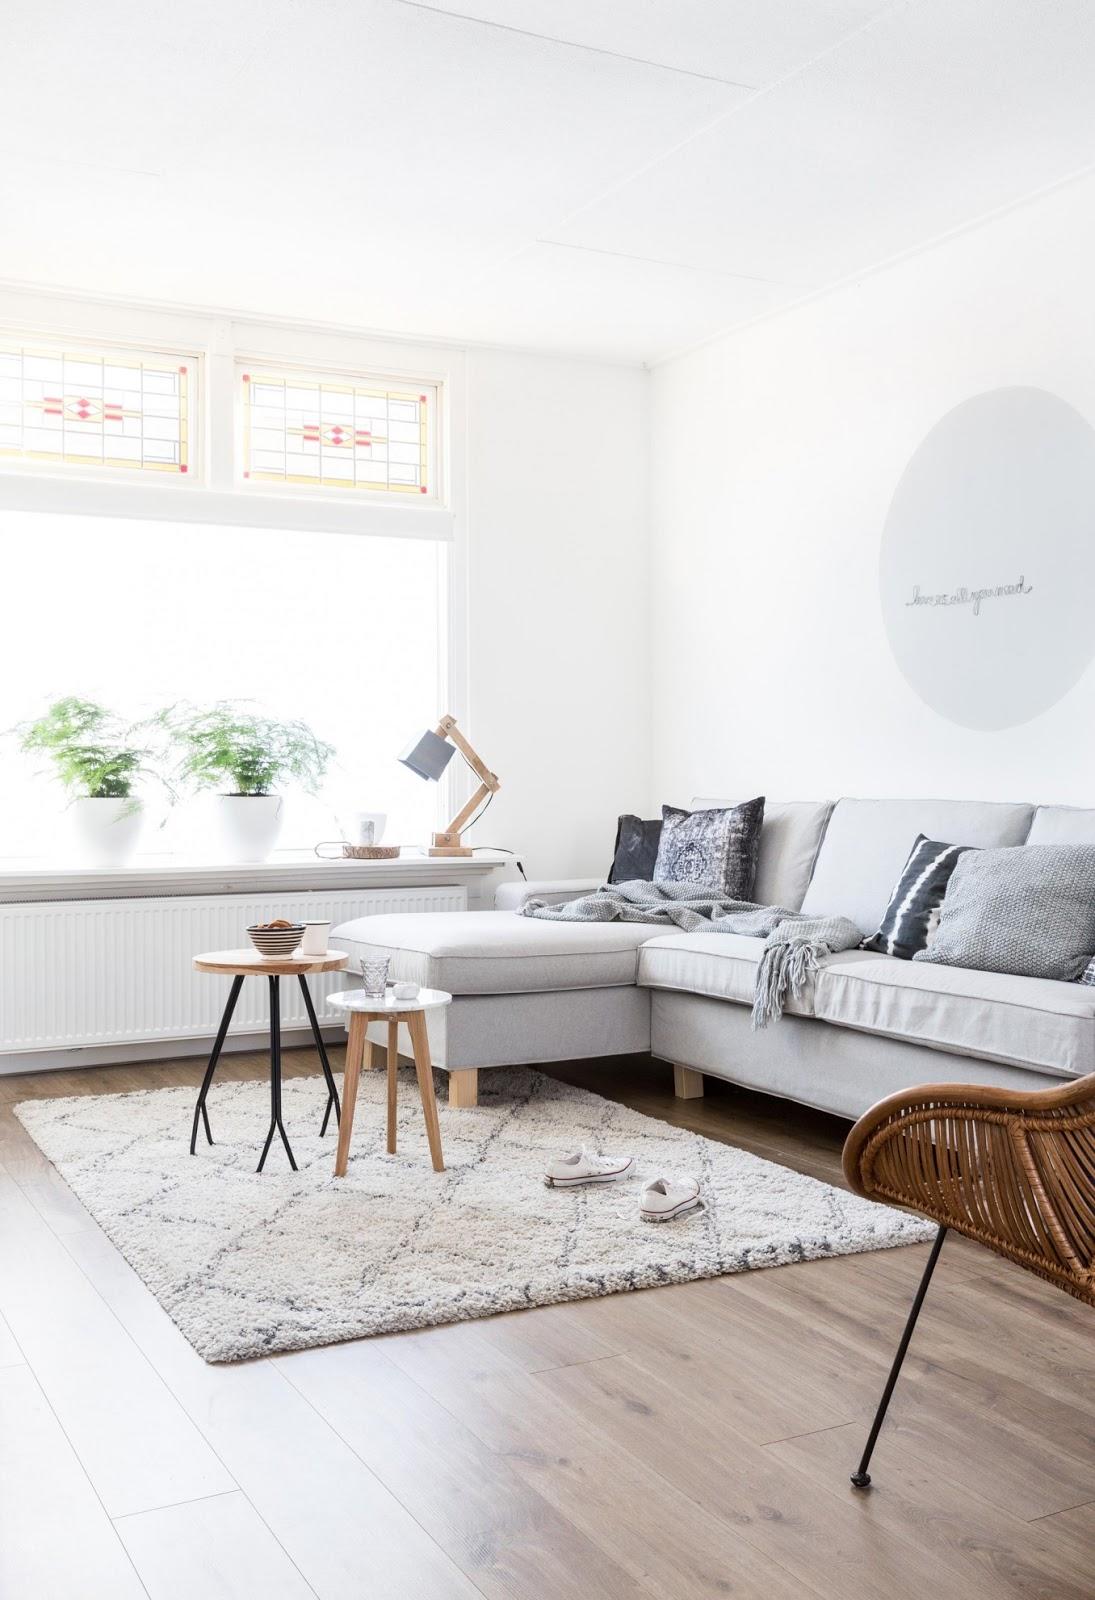 decordemon: 20s terraced house in Zwolle, Netherlands